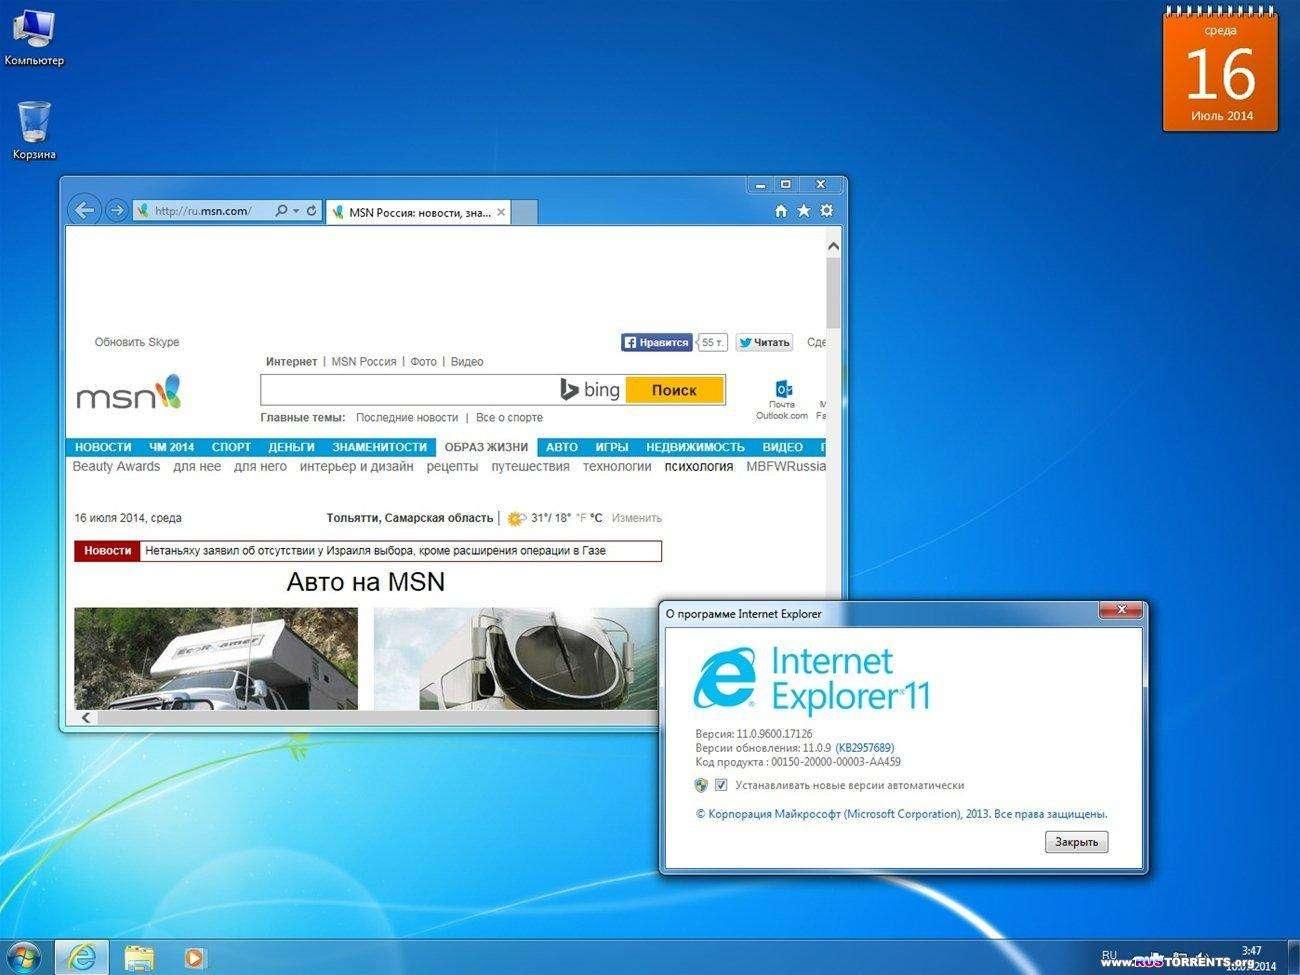 Windows 7 SP1 AIO x64 WirA v.07.14 (RUS/2014)